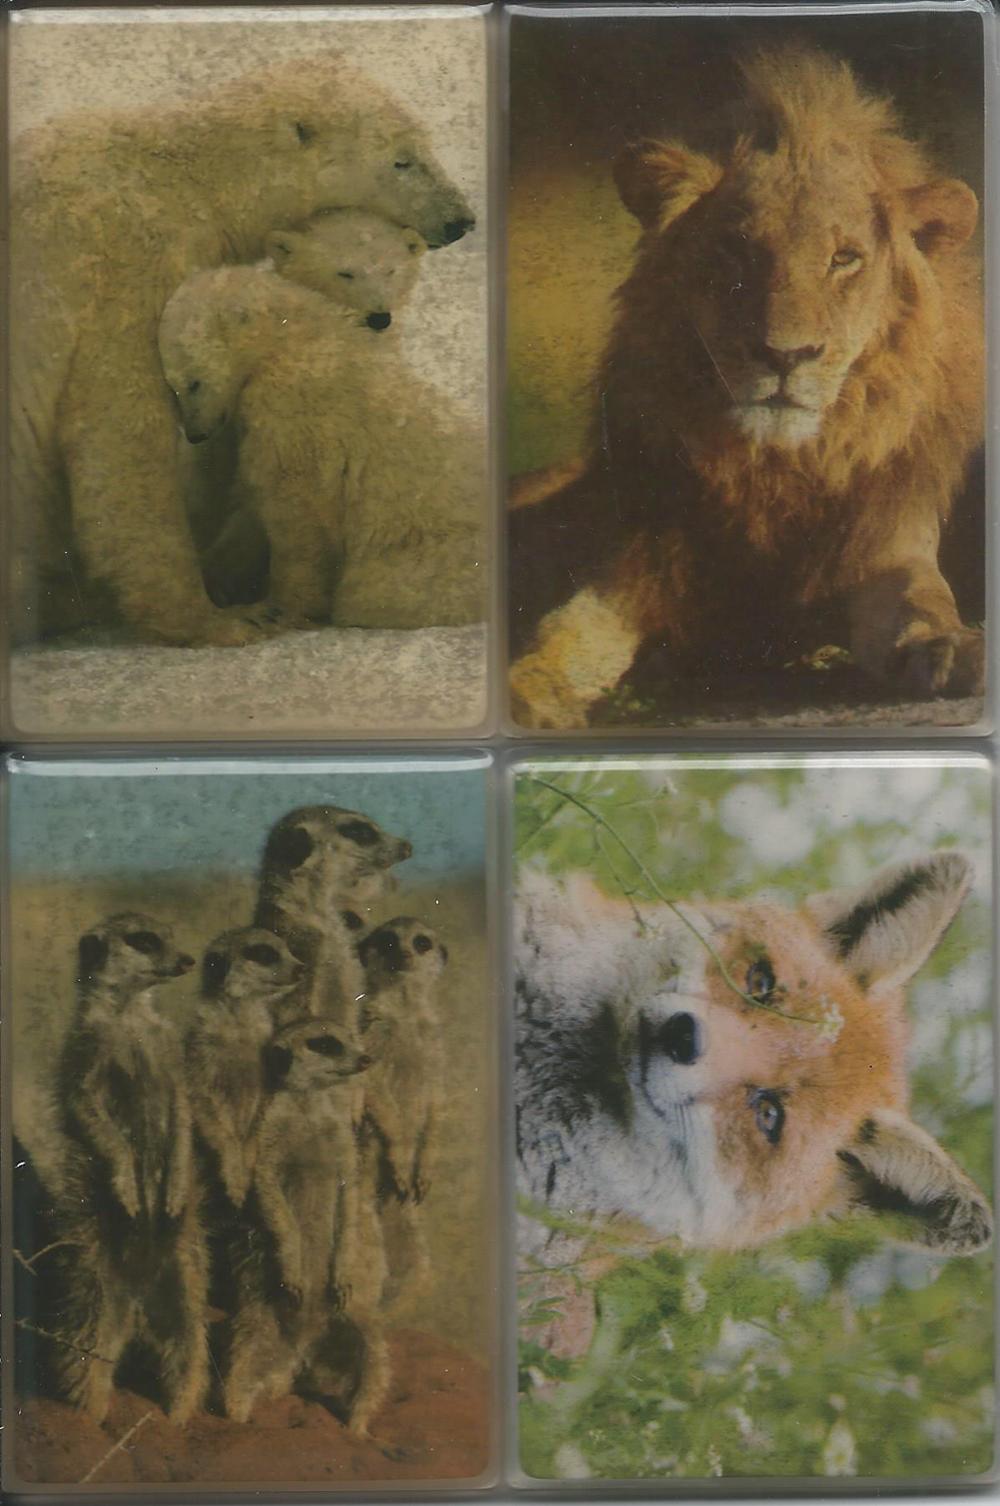 Animal Photo Magnets (Set of 4)